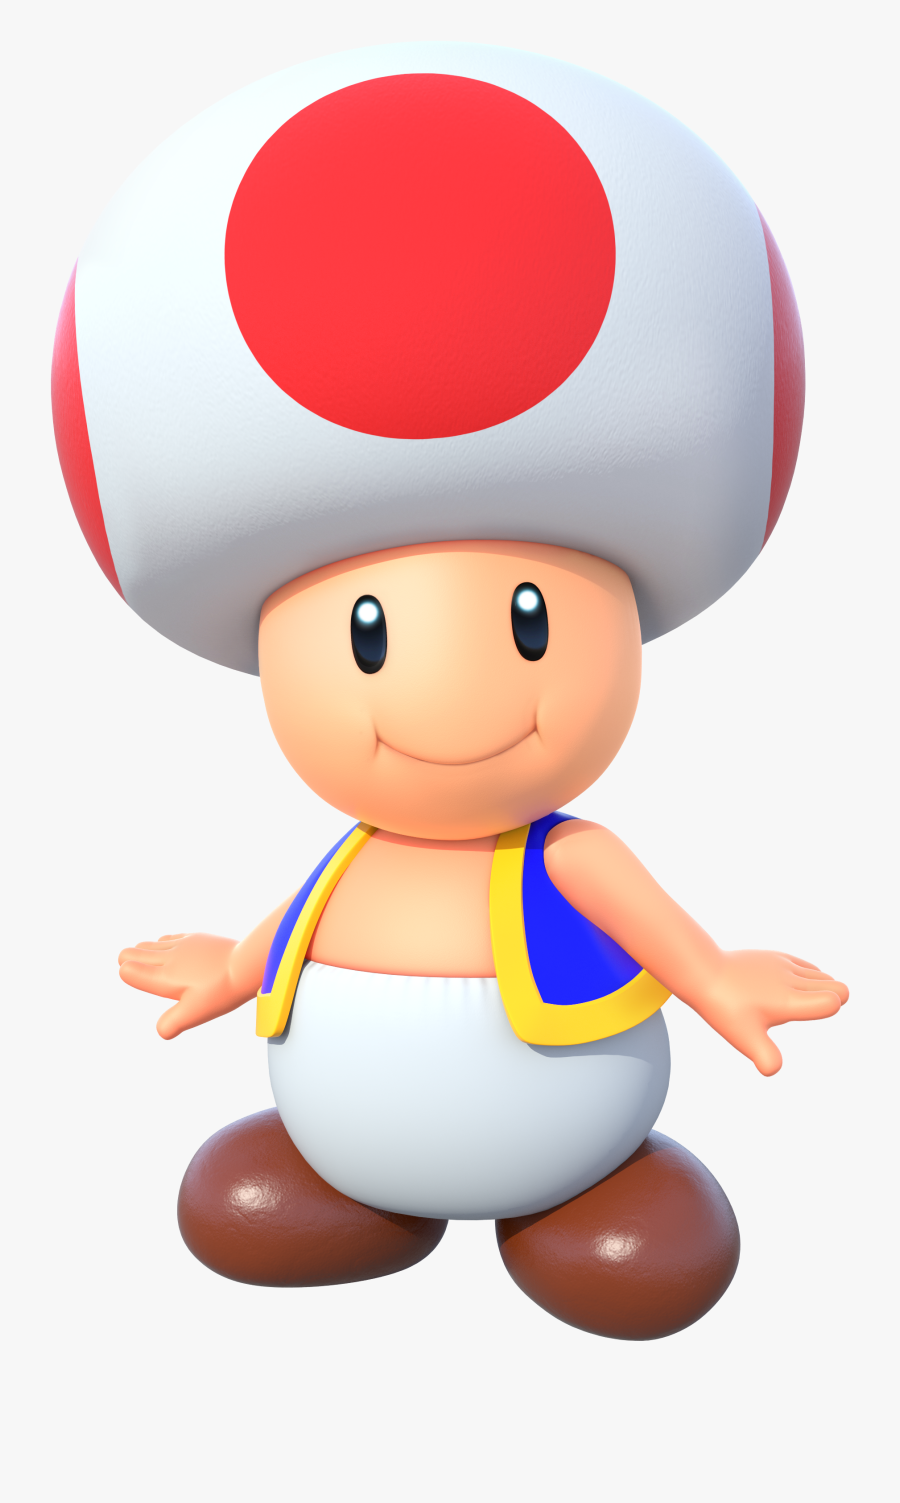 Super Mario Party Toad Clipart , Png Download - Super Mario Characters Png, Transparent Clipart